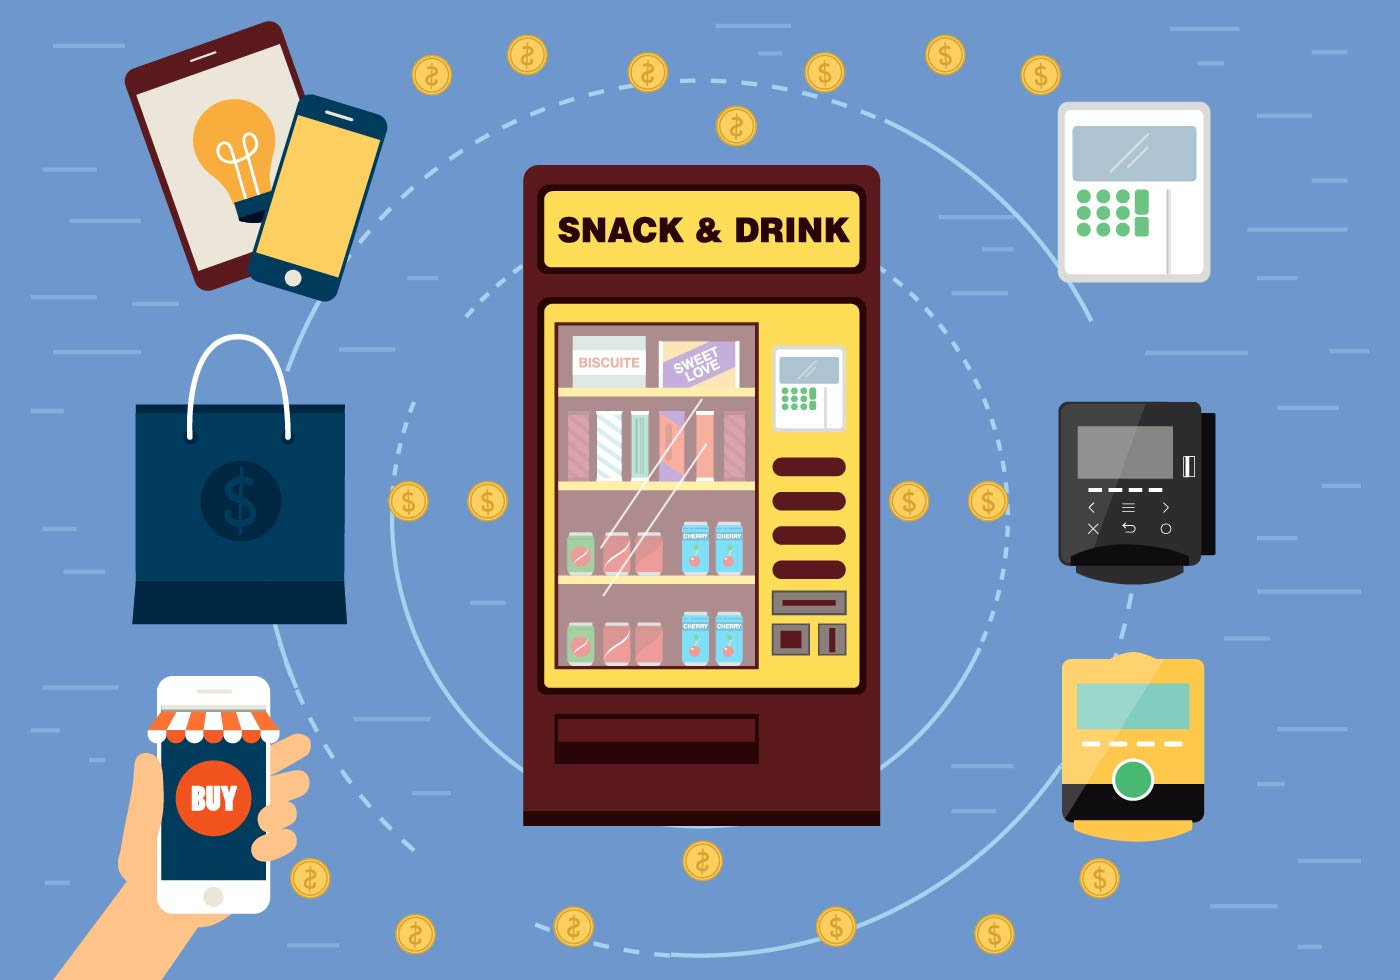 Coin Washing Machine >> Vending Machine Free Vector Art - (286 Free Downloads)